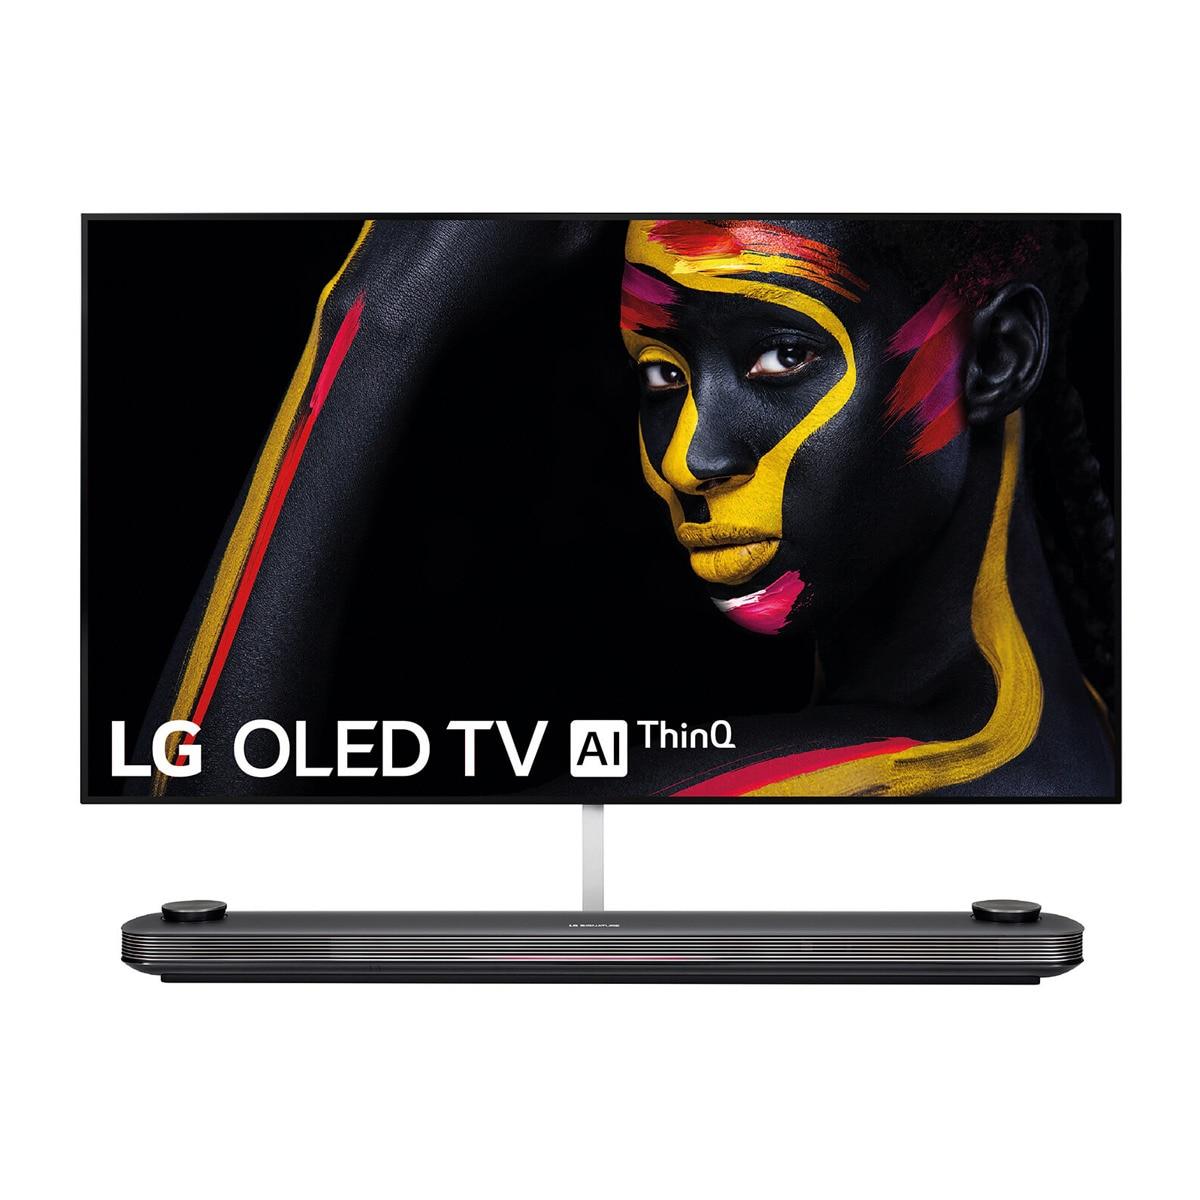 "TV OLED 65"" - LG SIGNATURE OLED65W9PLA, 4K HDR, Smart TV, Inteligencia Artificial, Alpha 9 Gen.2"